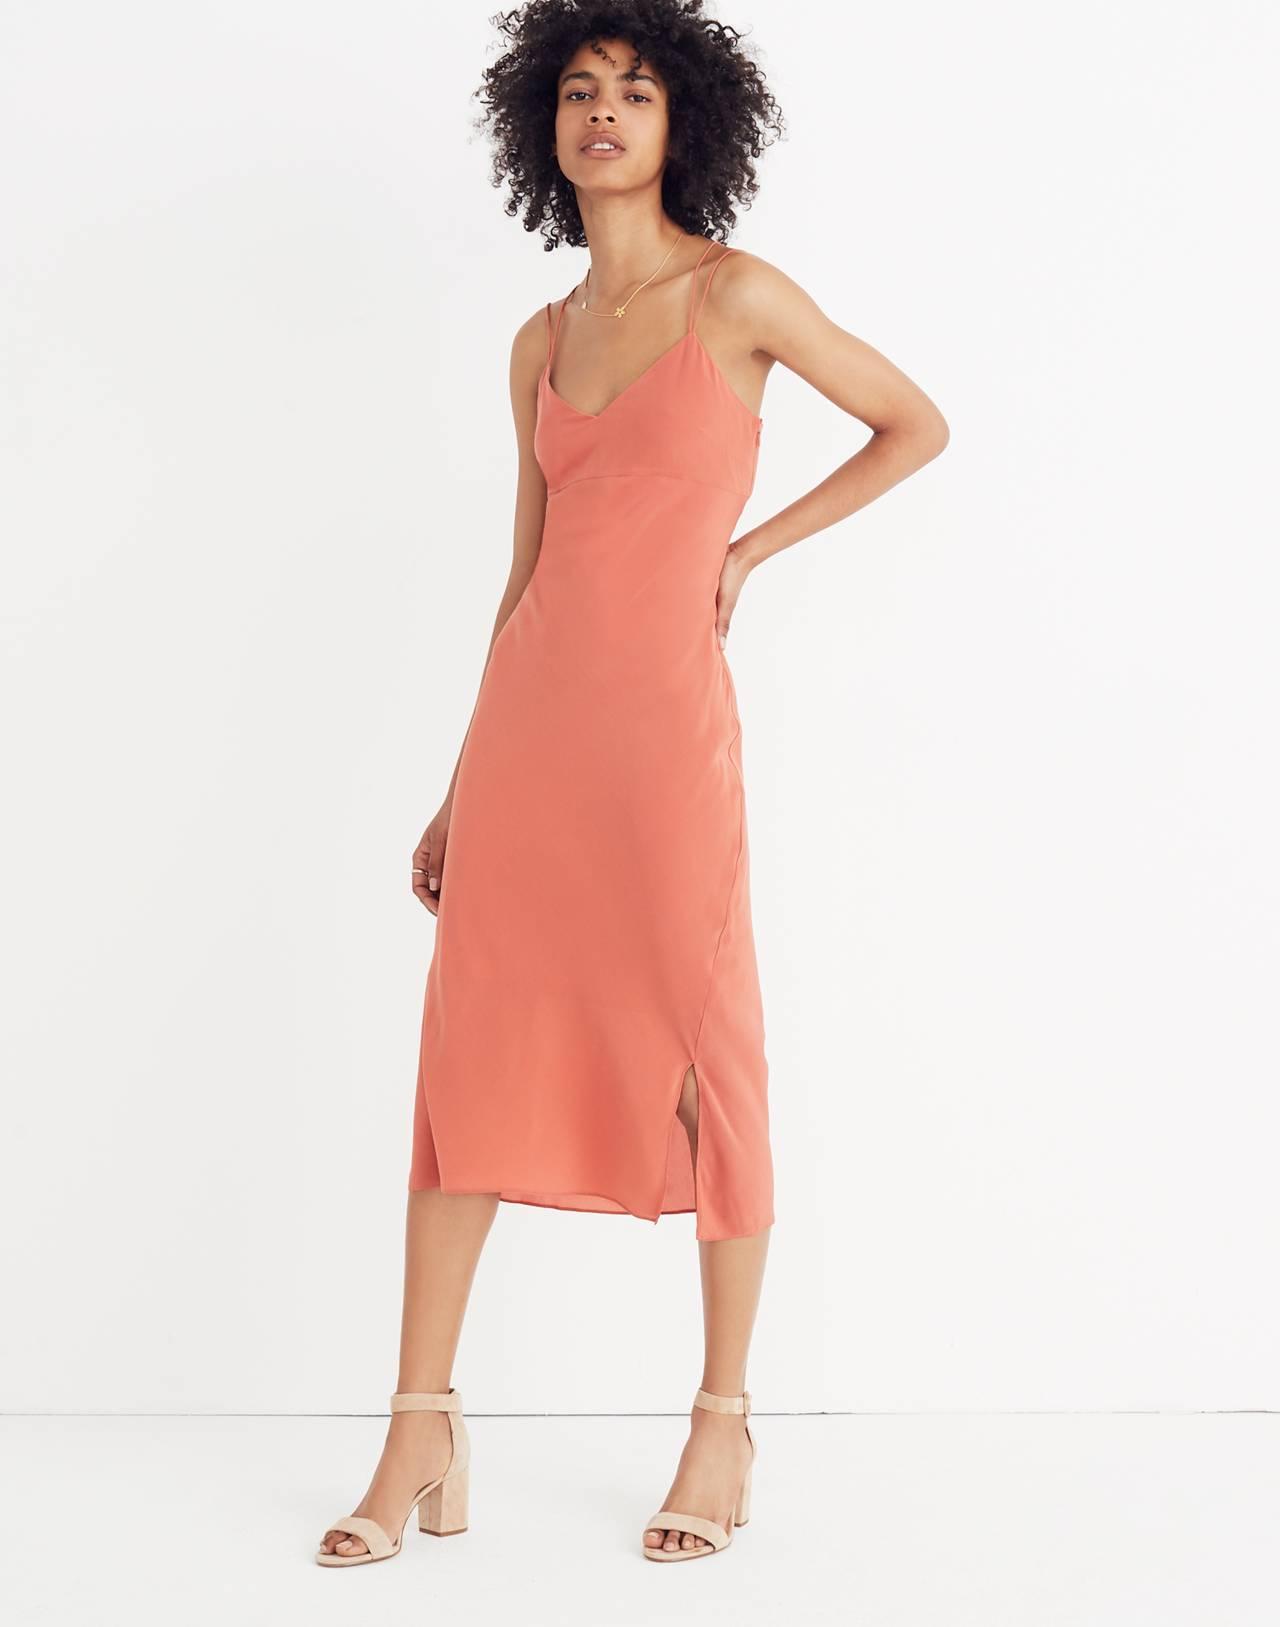 Silk Slip Dress in spiced rose image 1